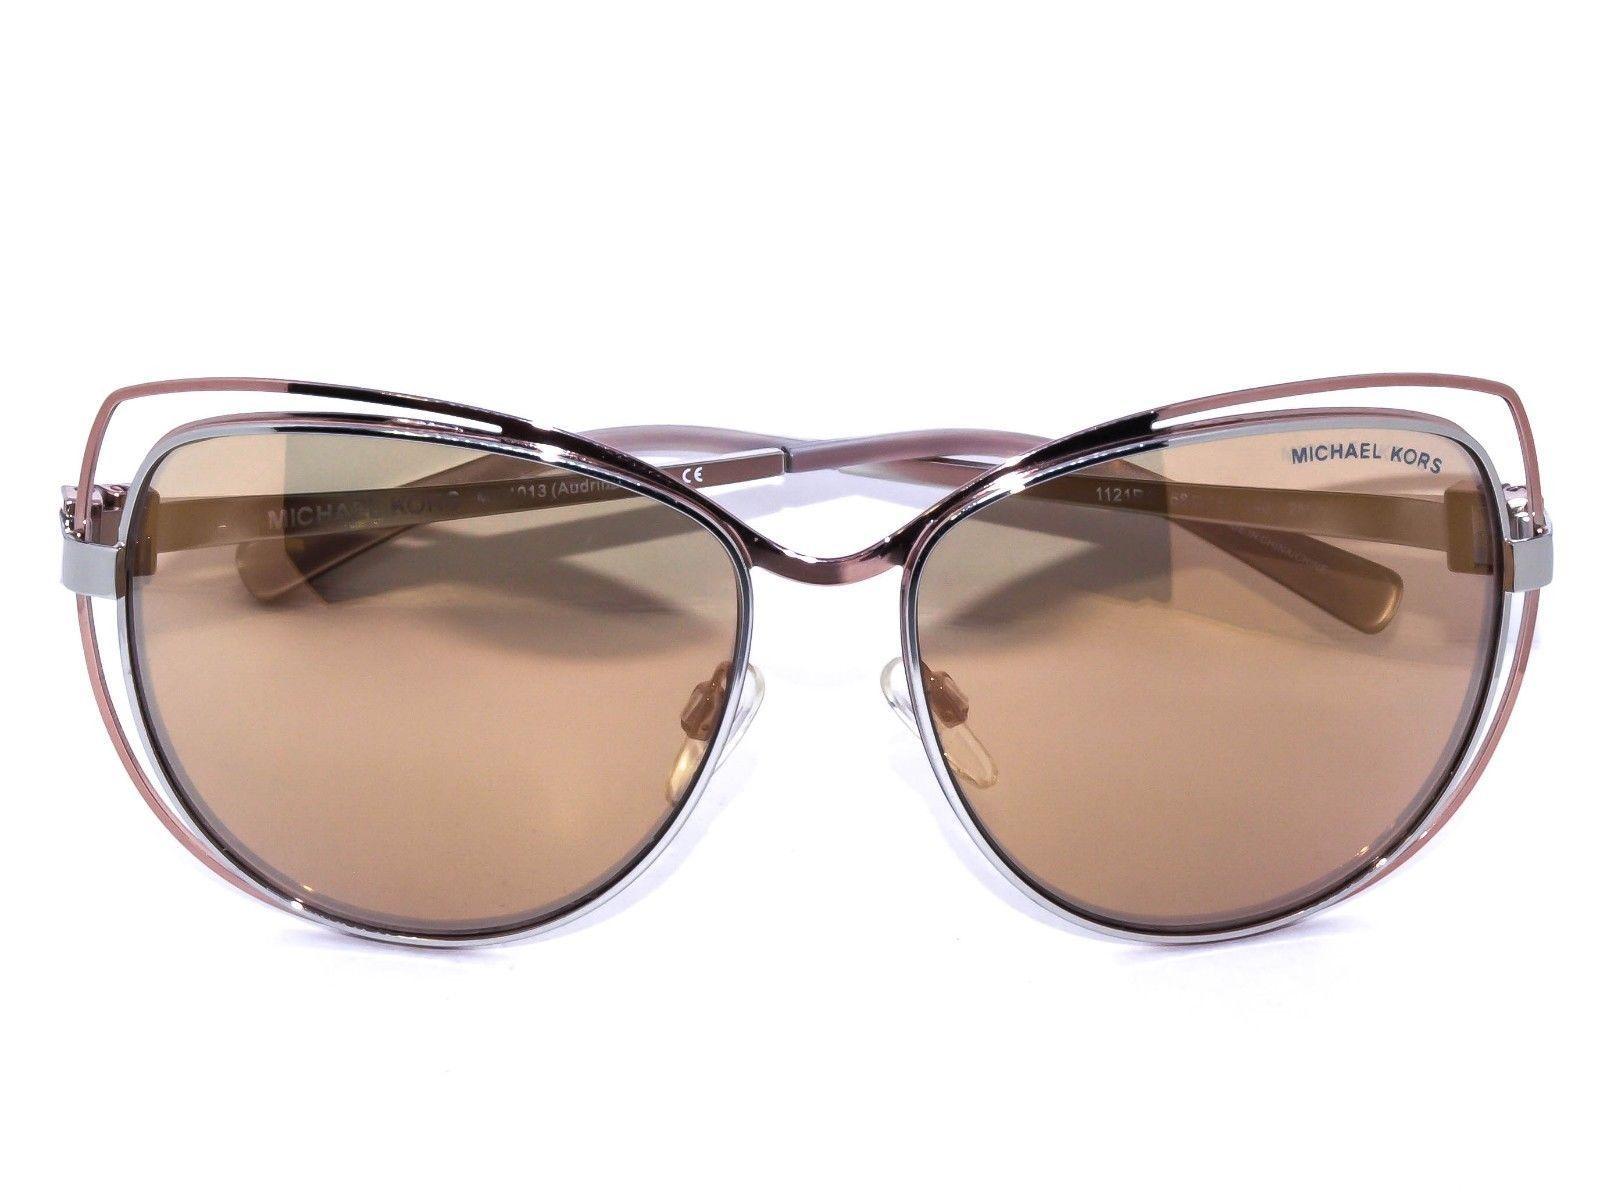 df850eaf1b Michael Kors Women s Cat Eye Sunglasses MK1013 Audrina Mirrored Gold 58  15  140